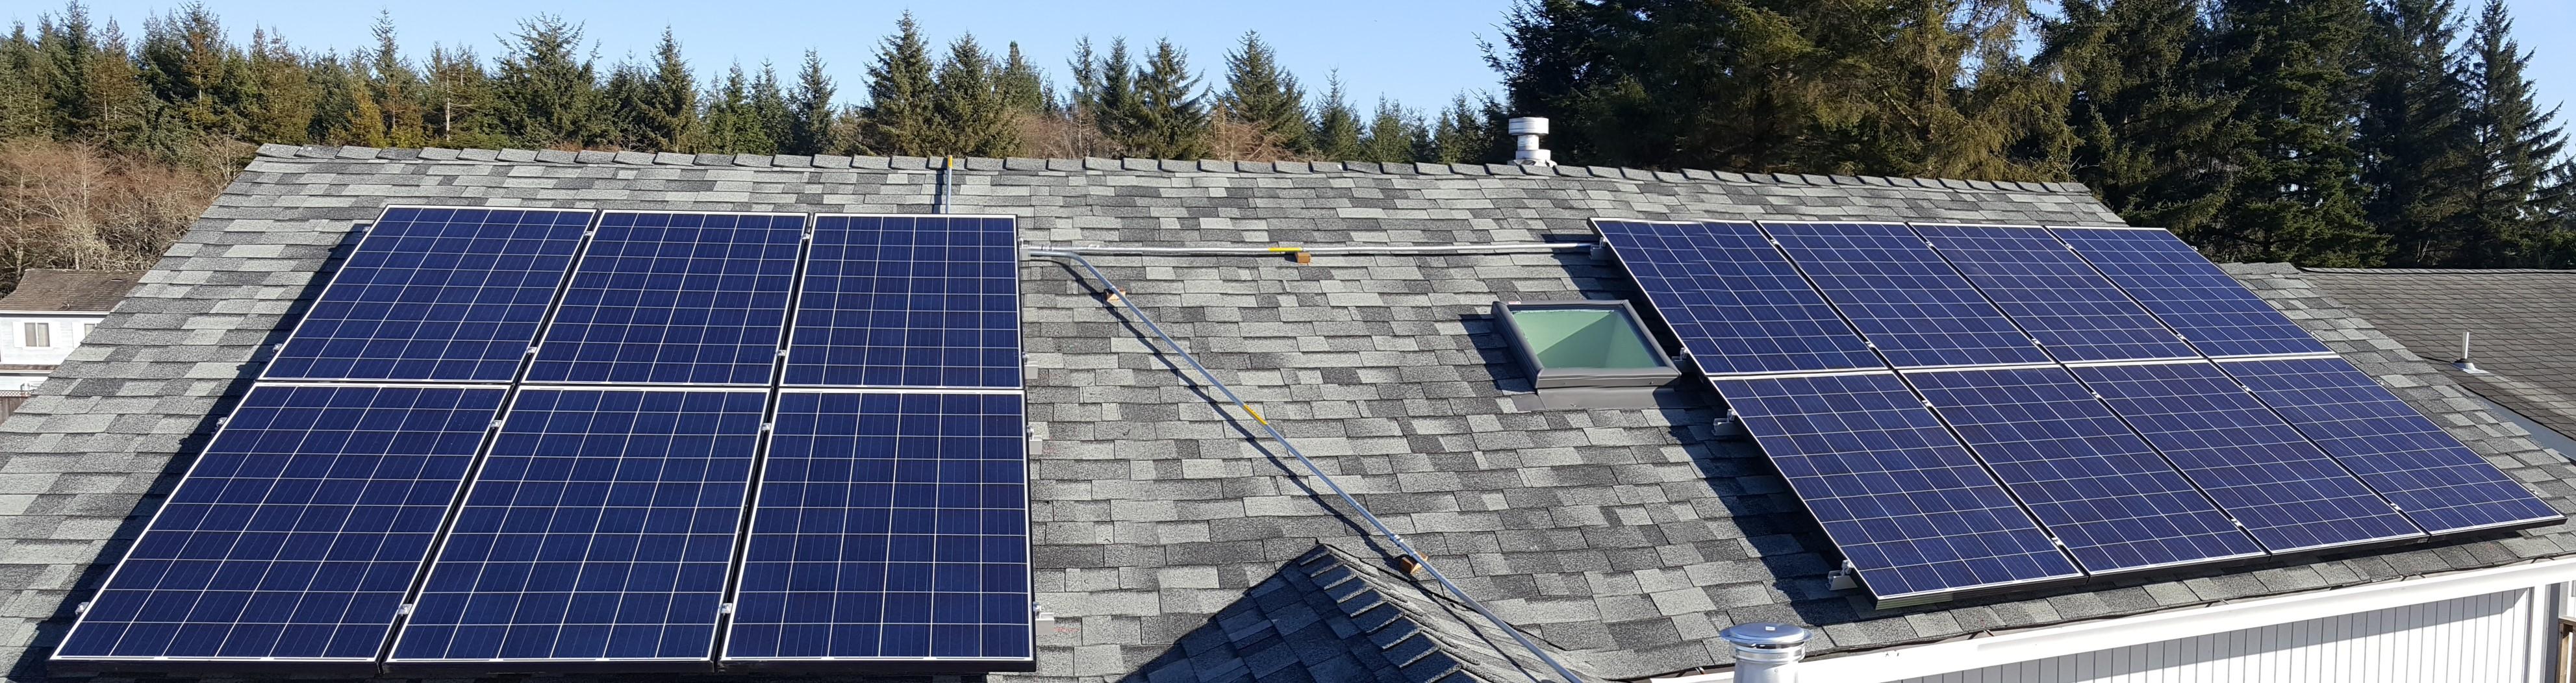 20170114.solar.conduit